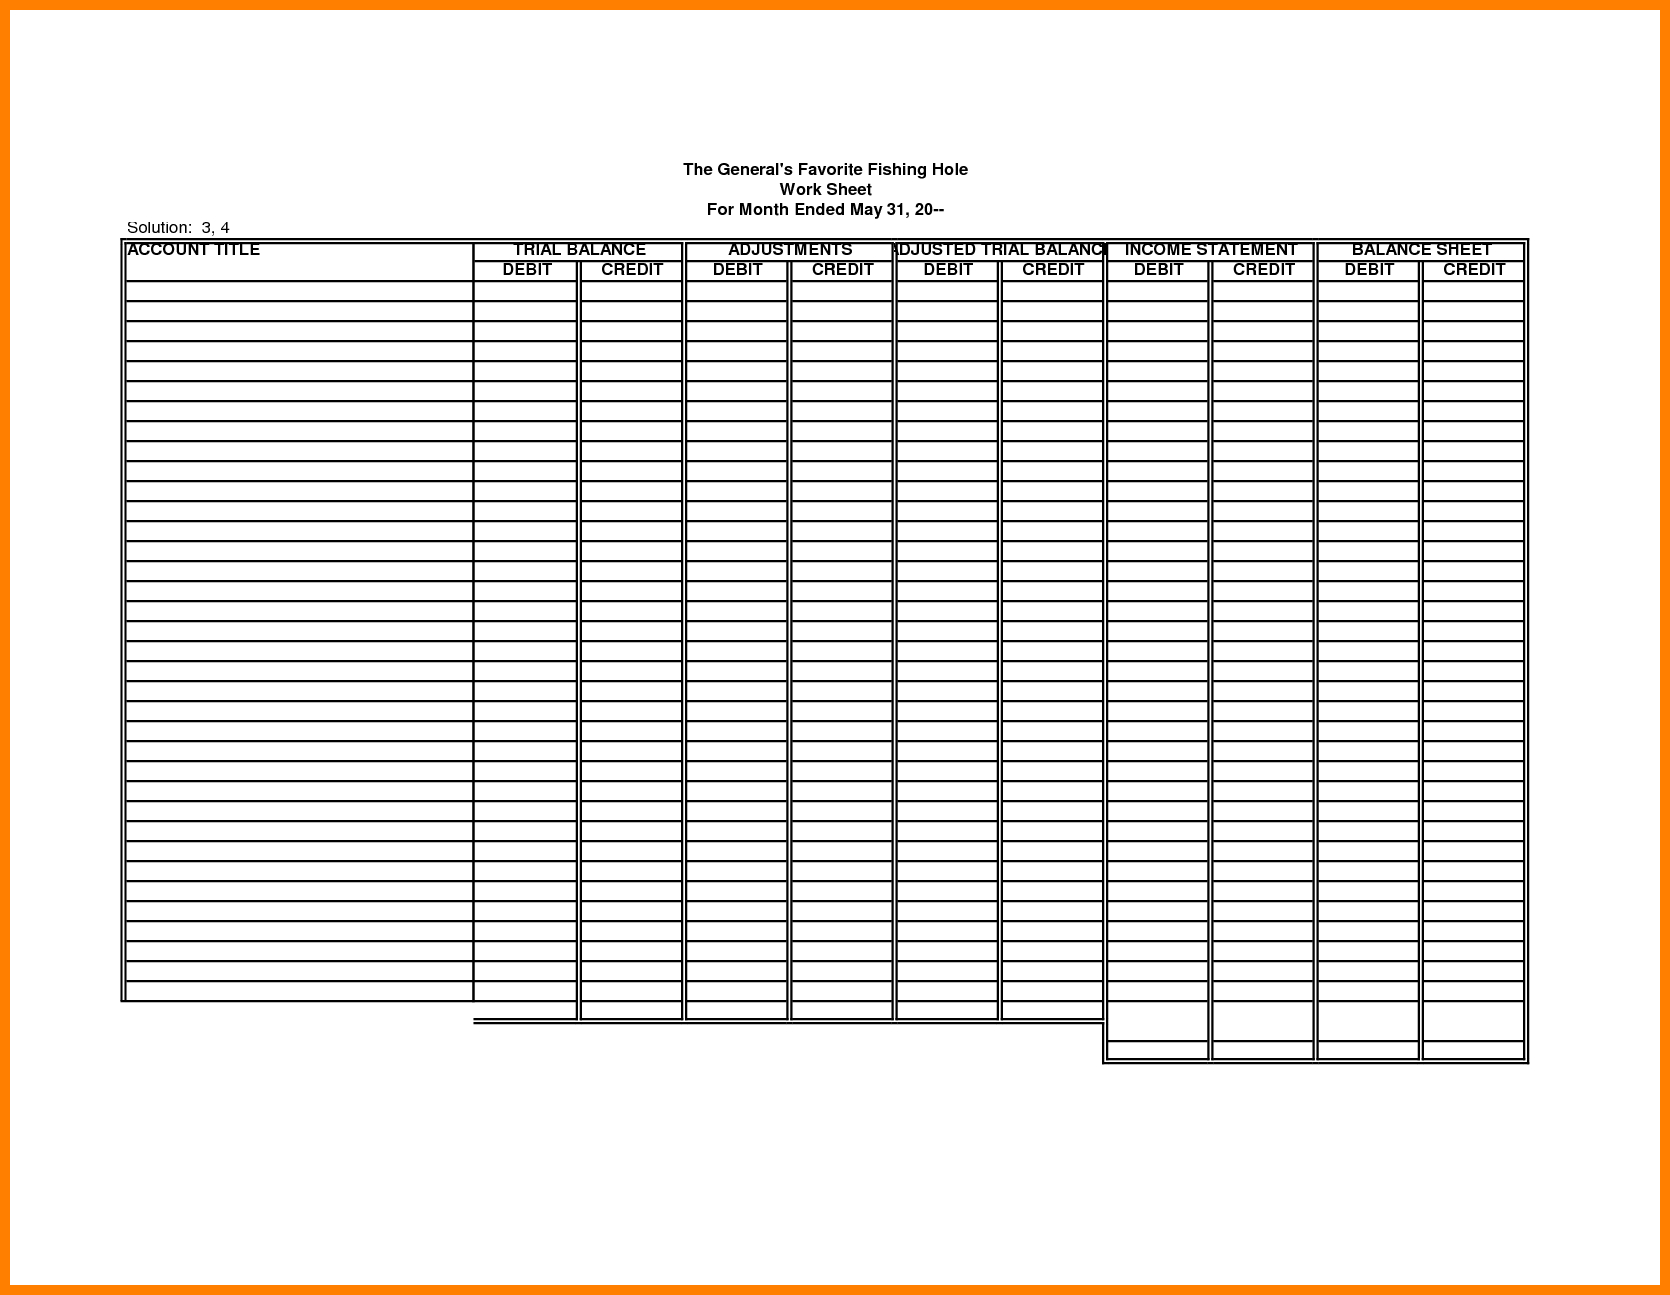 Accounting Worksheet Template - Koran.sticken.co | Accounting Worksheet Template Printable